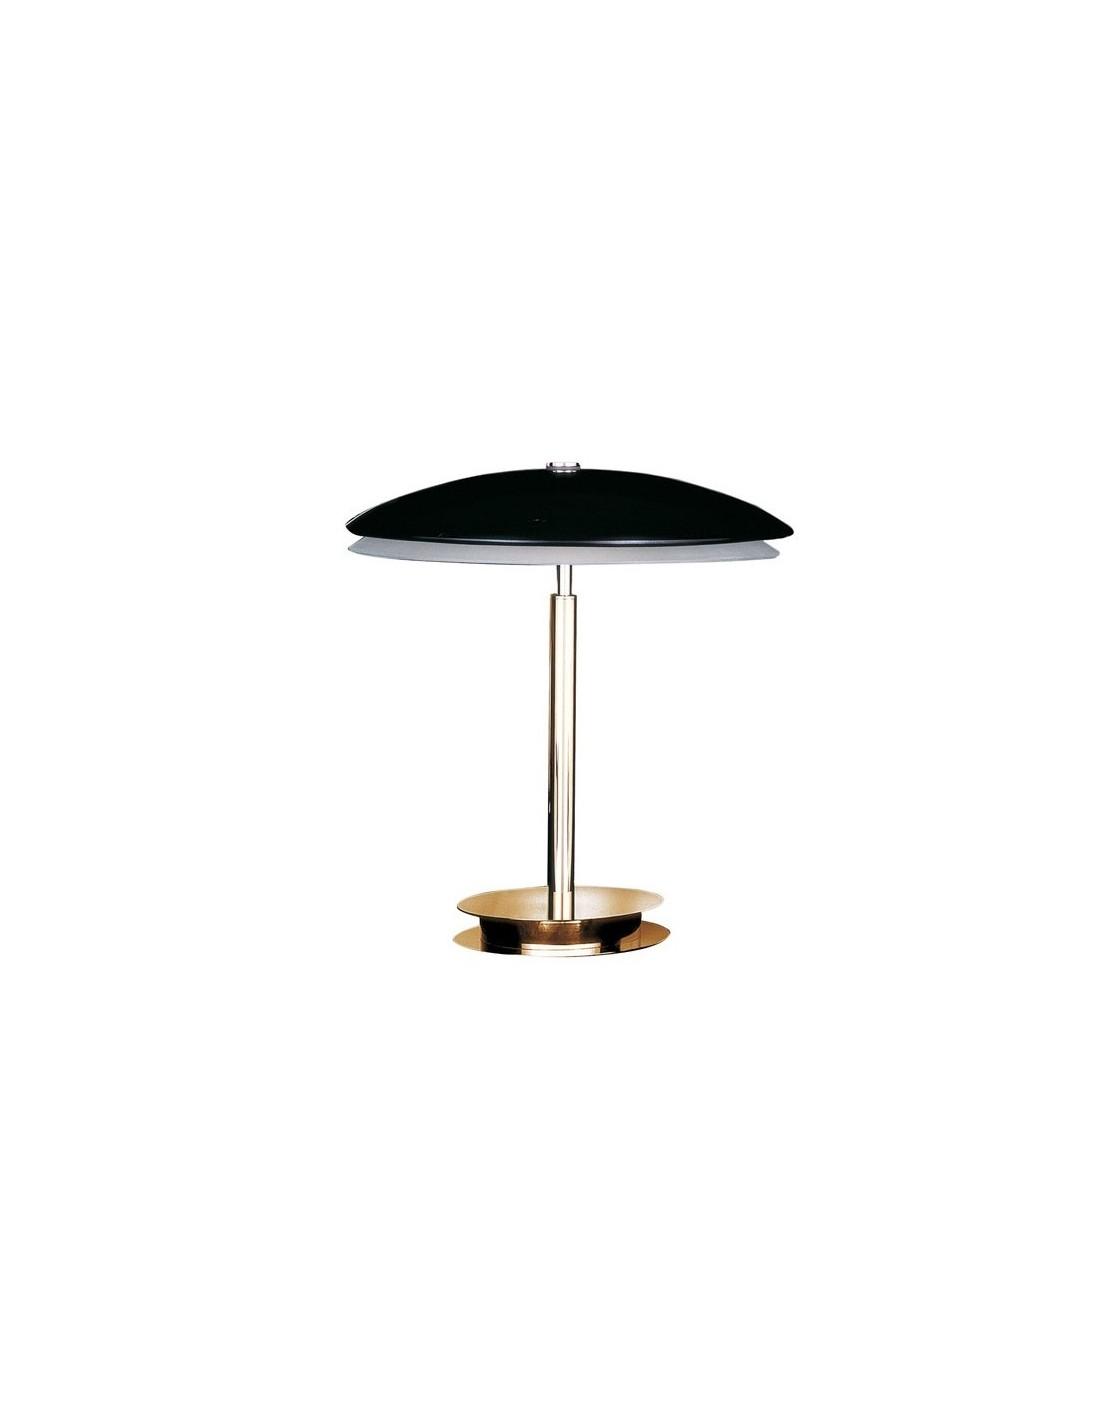 Lampe de Table Bis vue de face Fontana Arte